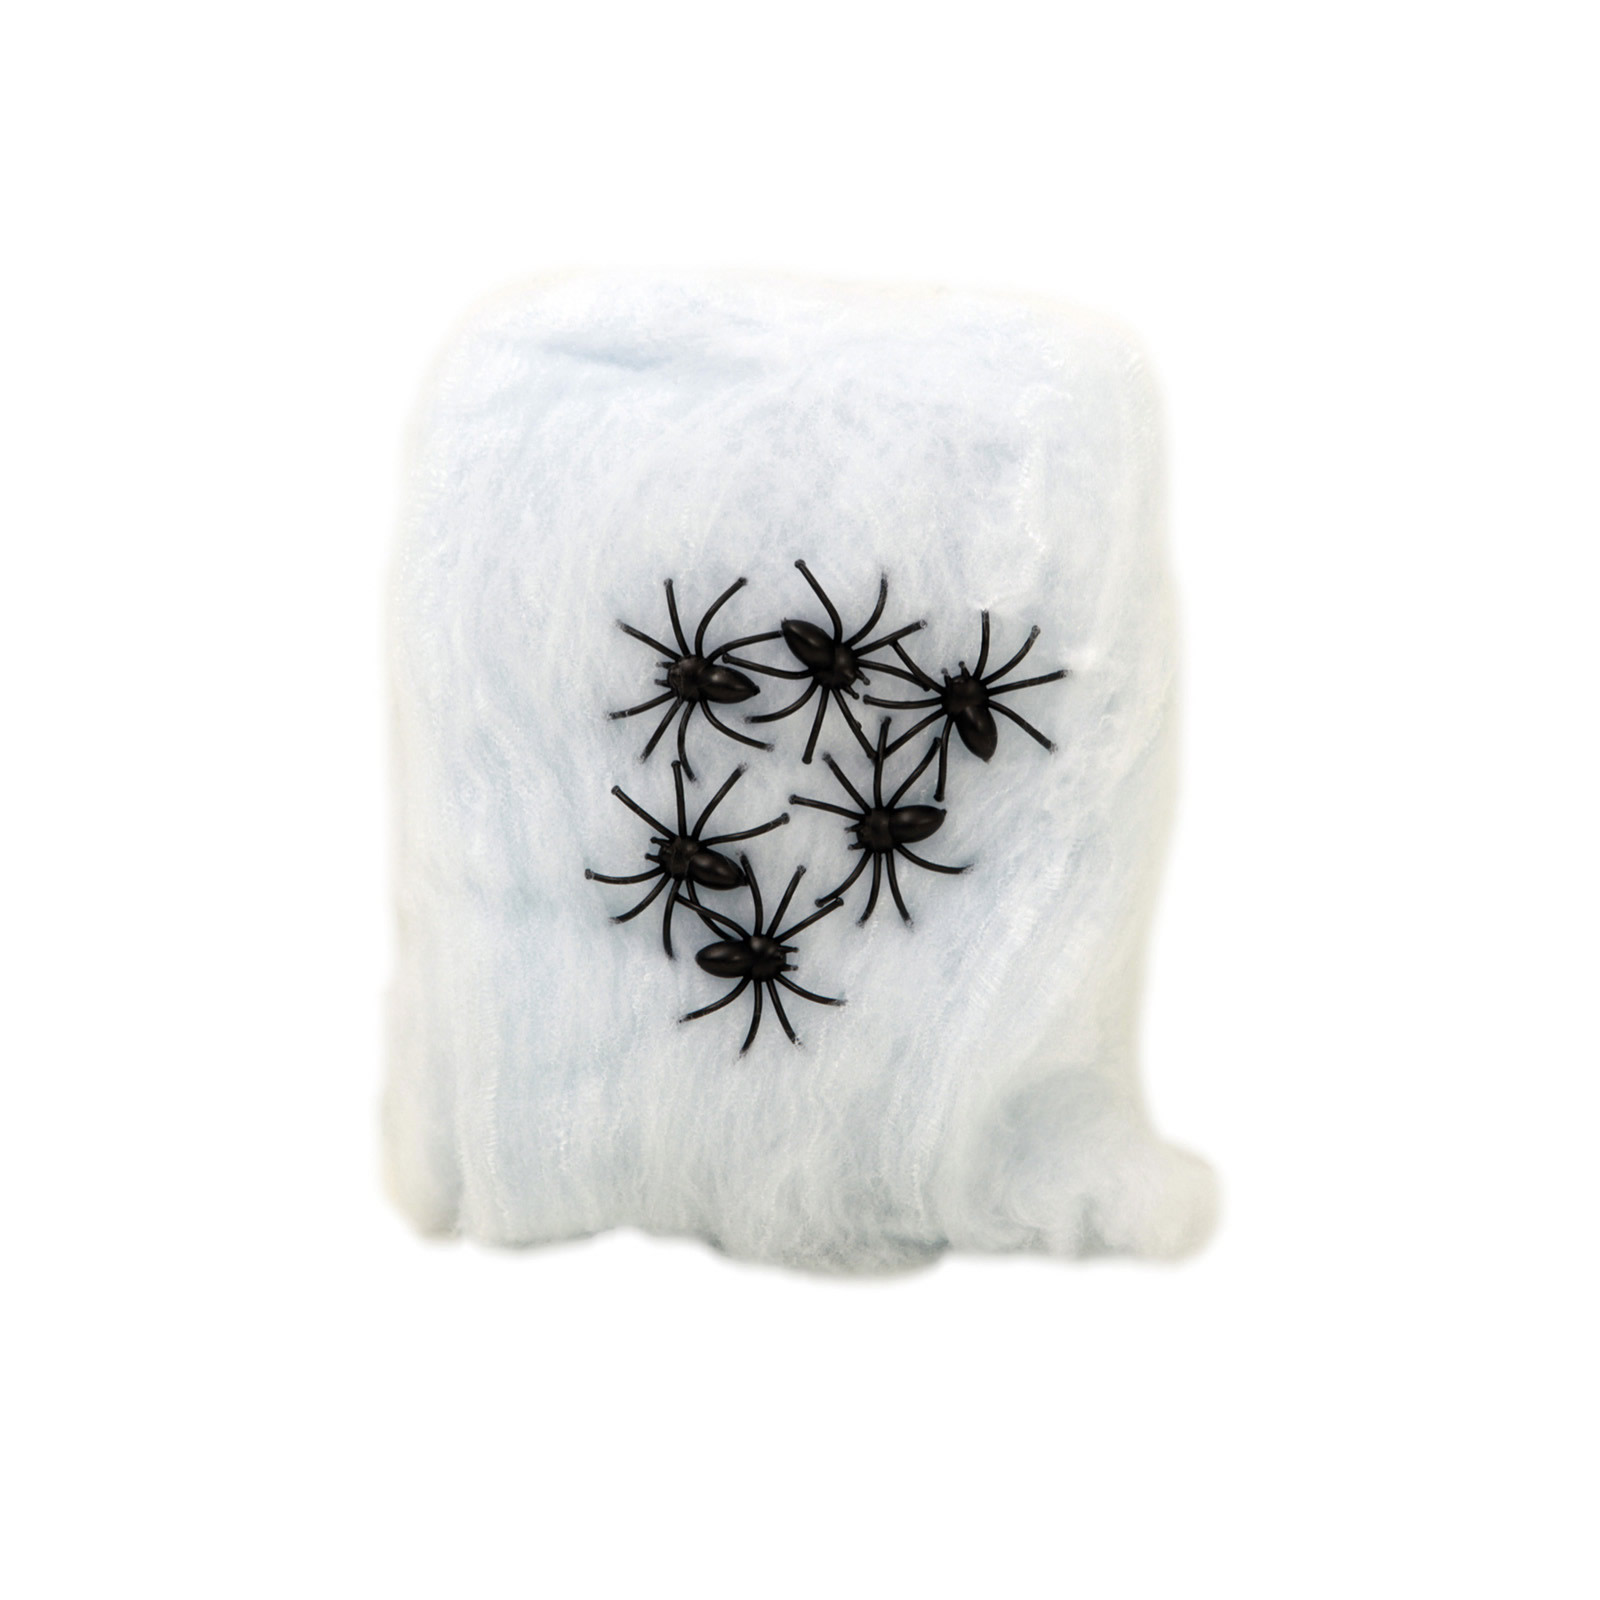 3 bolsas de telarañas blanca 80 gramos